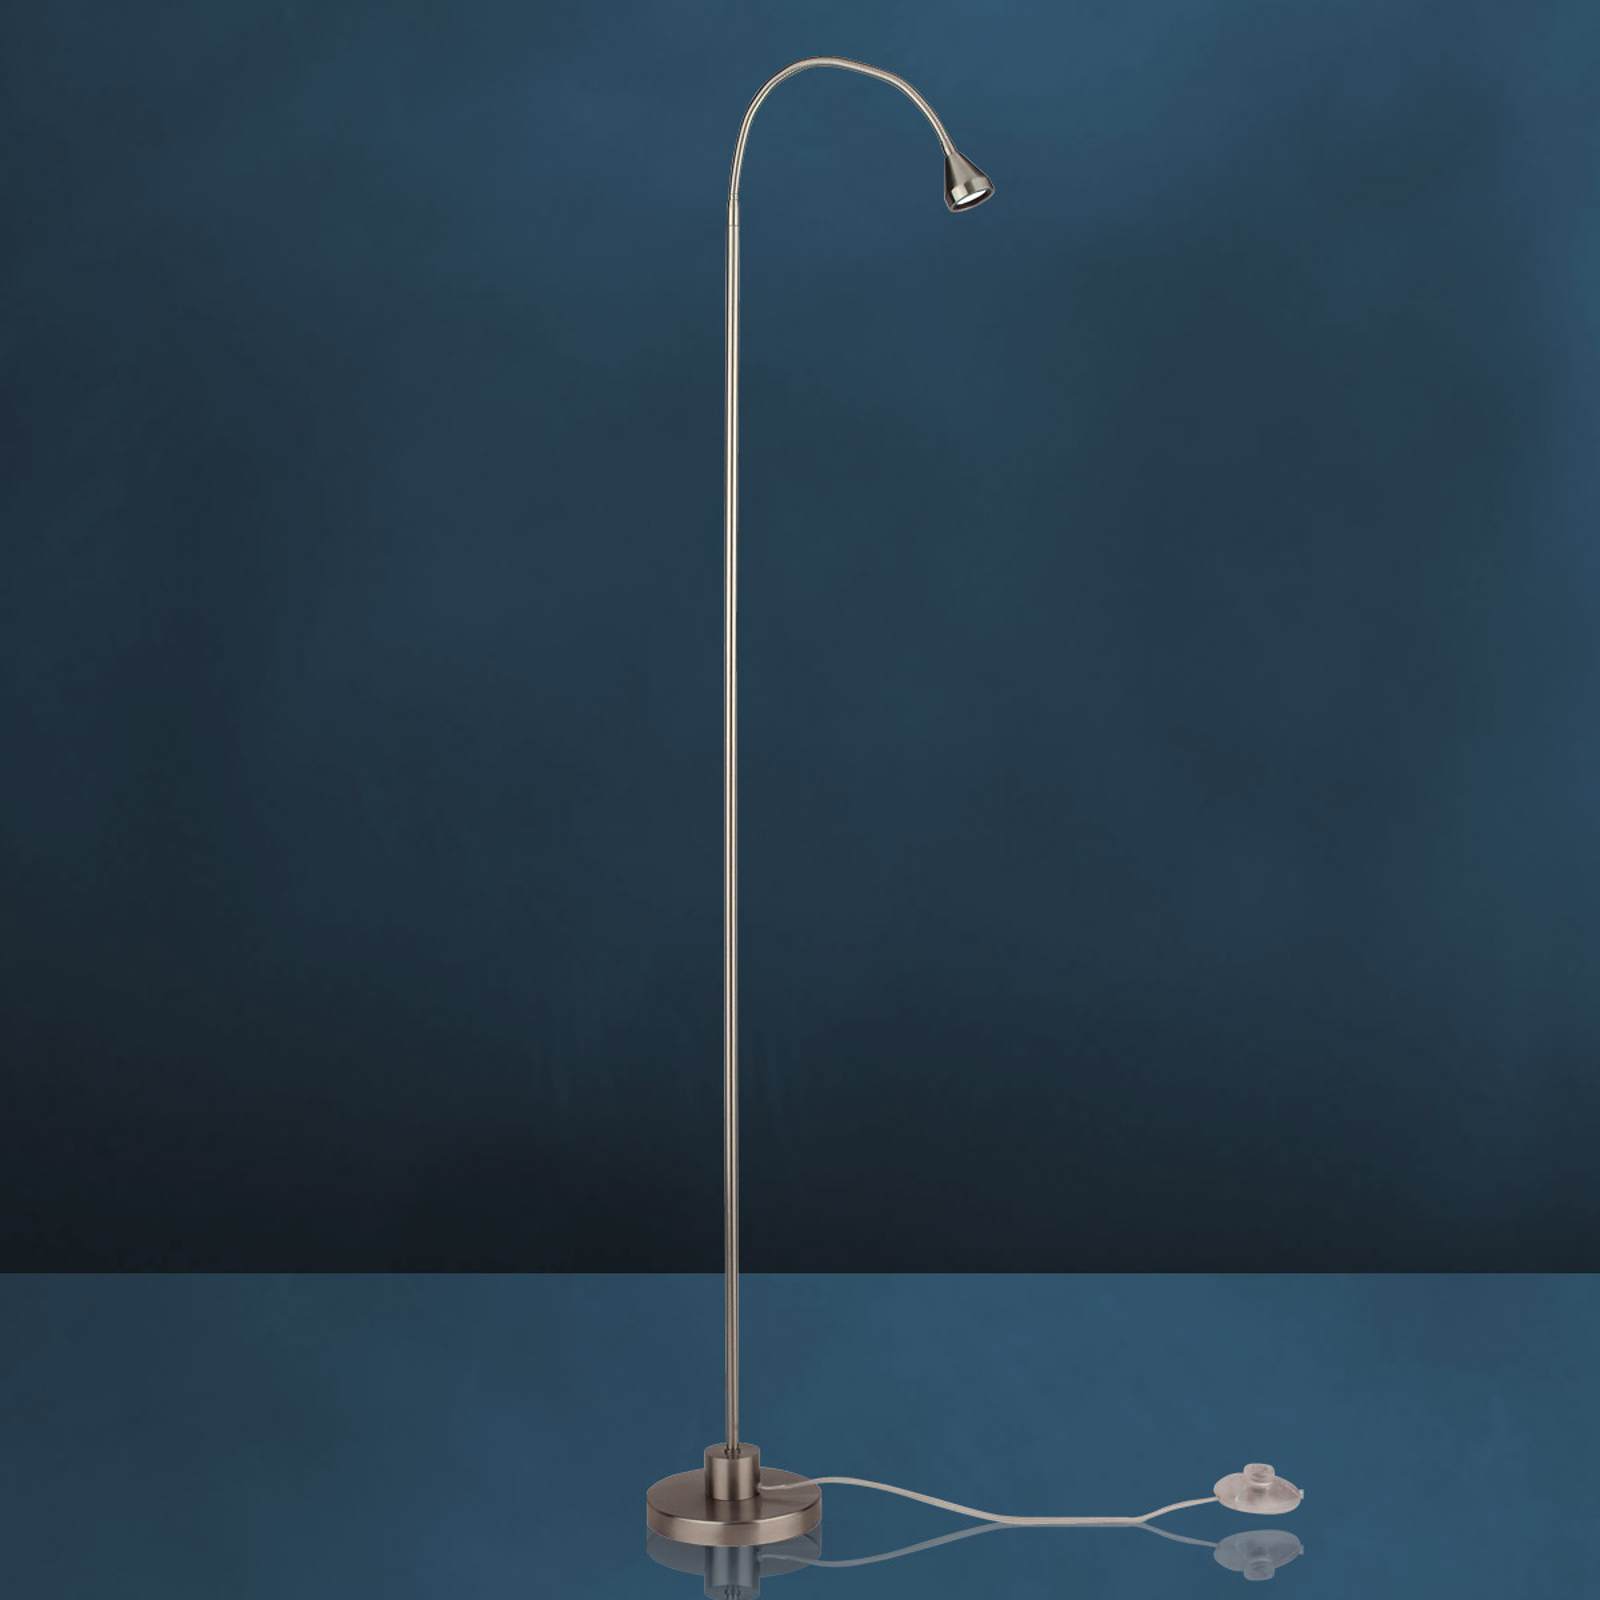 Moderná stojaca LED lampa_1524041_1